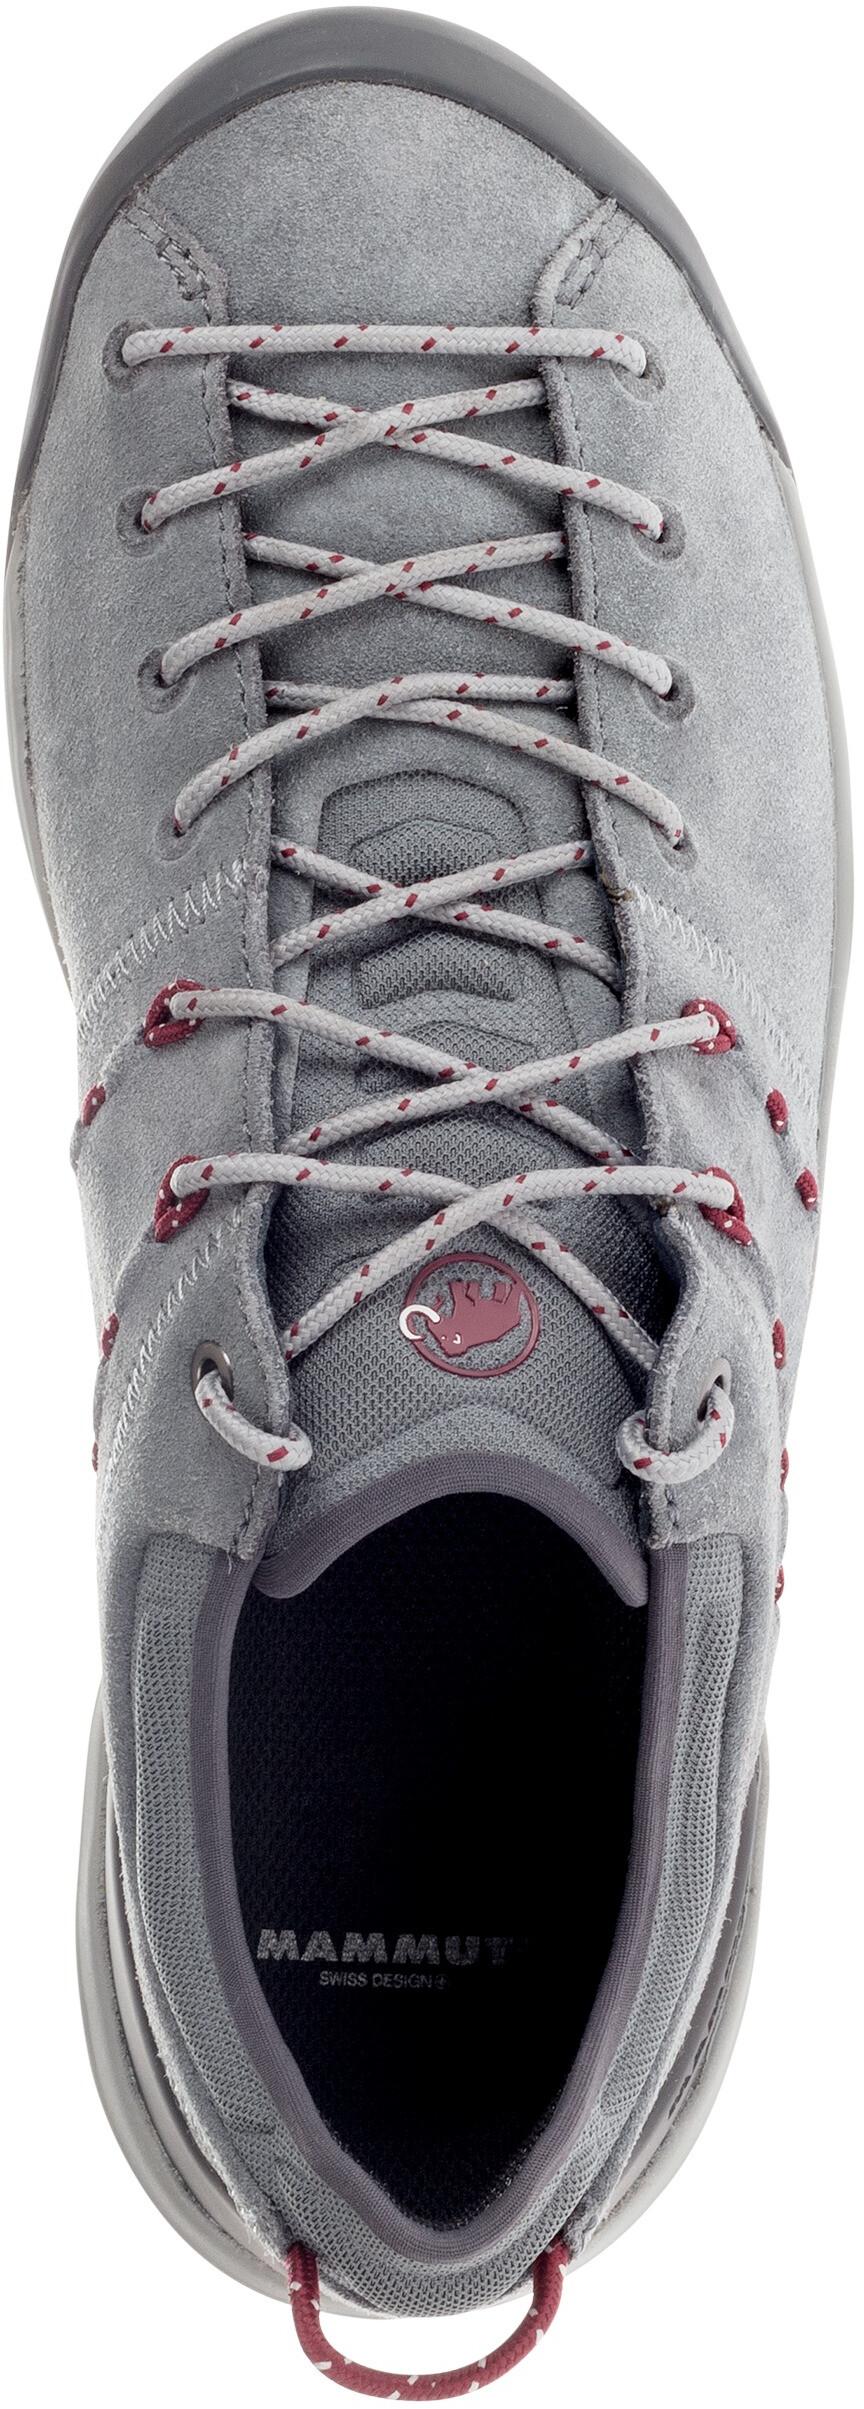 8ee67e2c9b8144 Mammut Hueco Low GTX Shoes Women grey at Addnature.co.uk